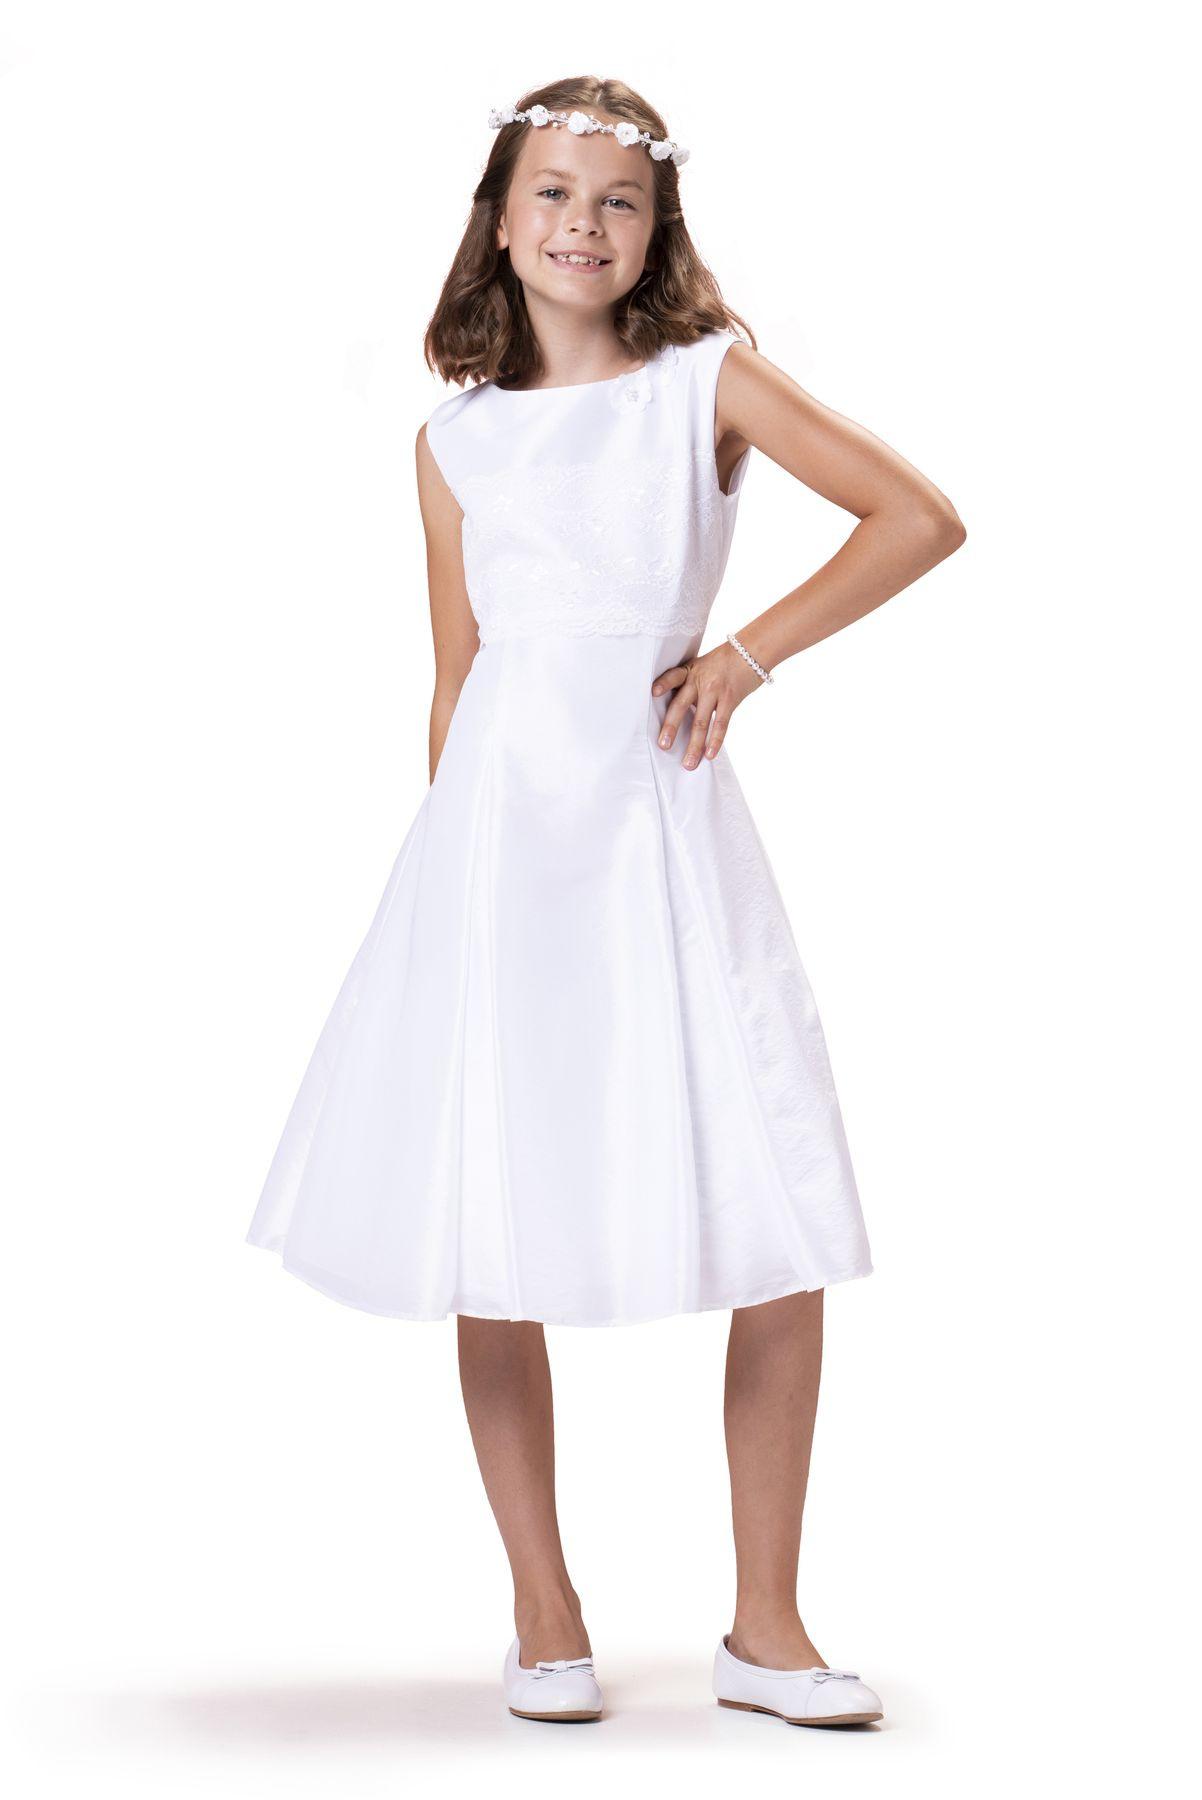 Bian Corella Kommunionkleid 520210 Regular Fit  Weiß